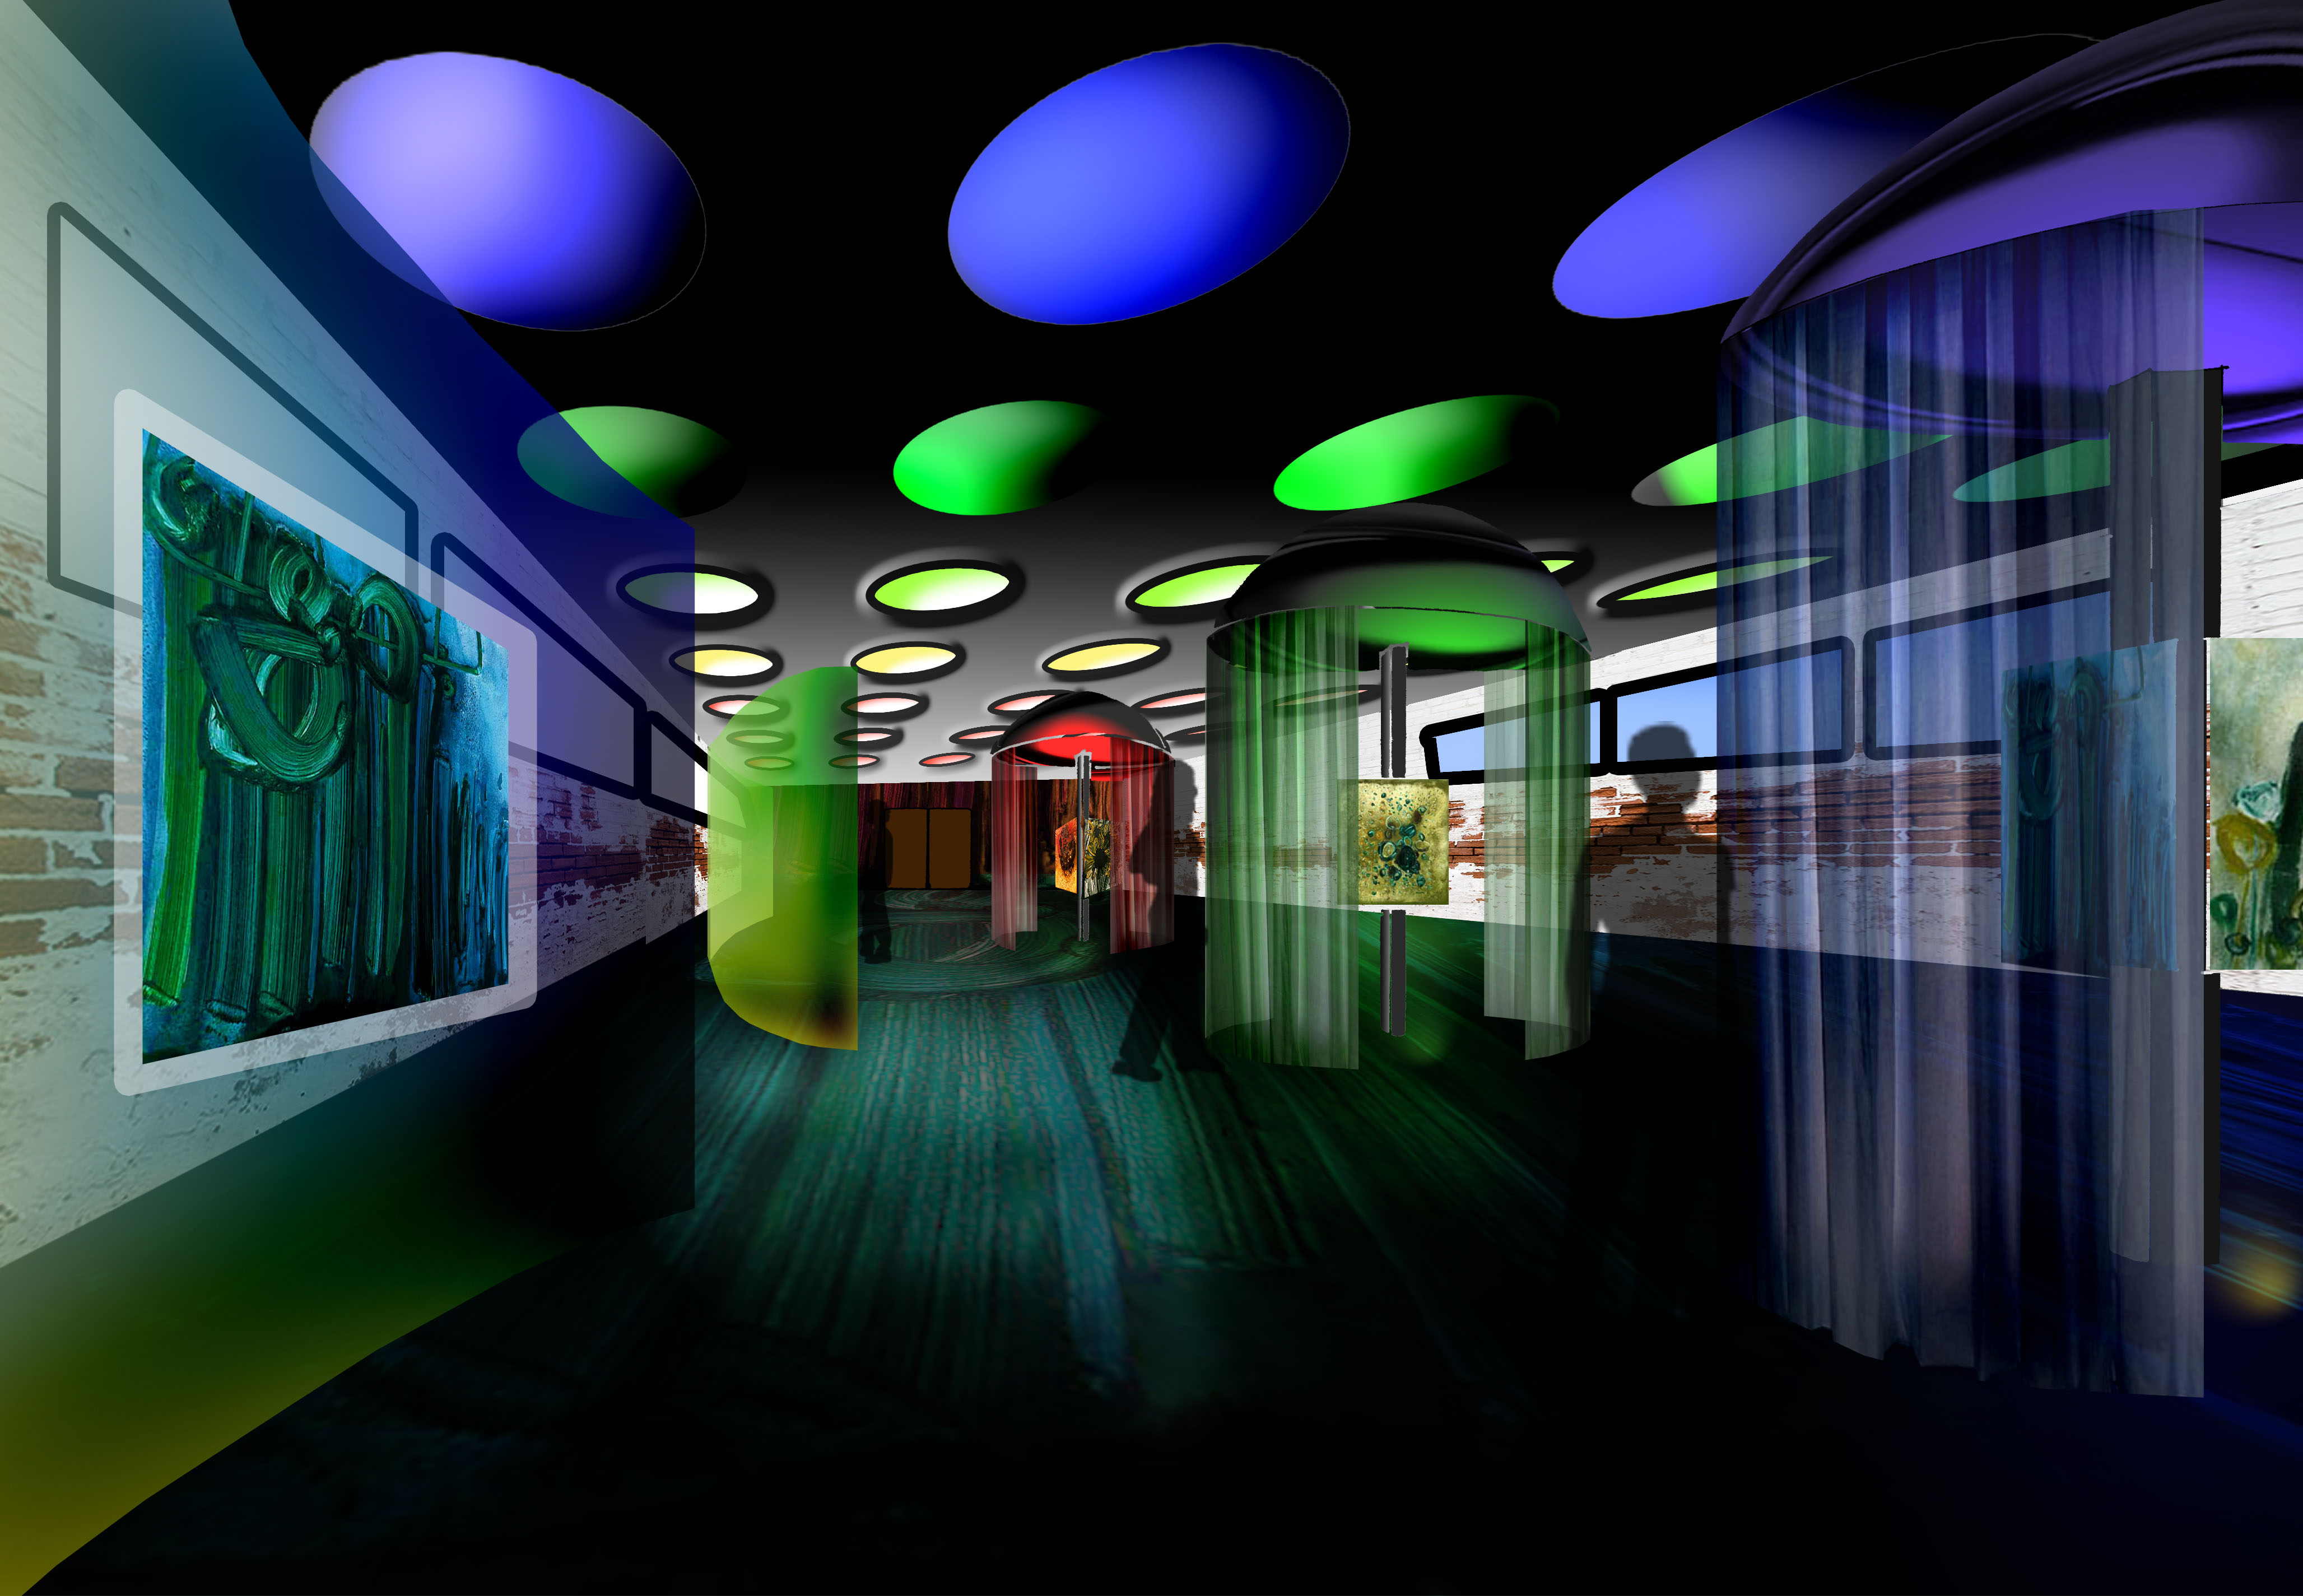 Exhibition Space By Clarissa Santoso At